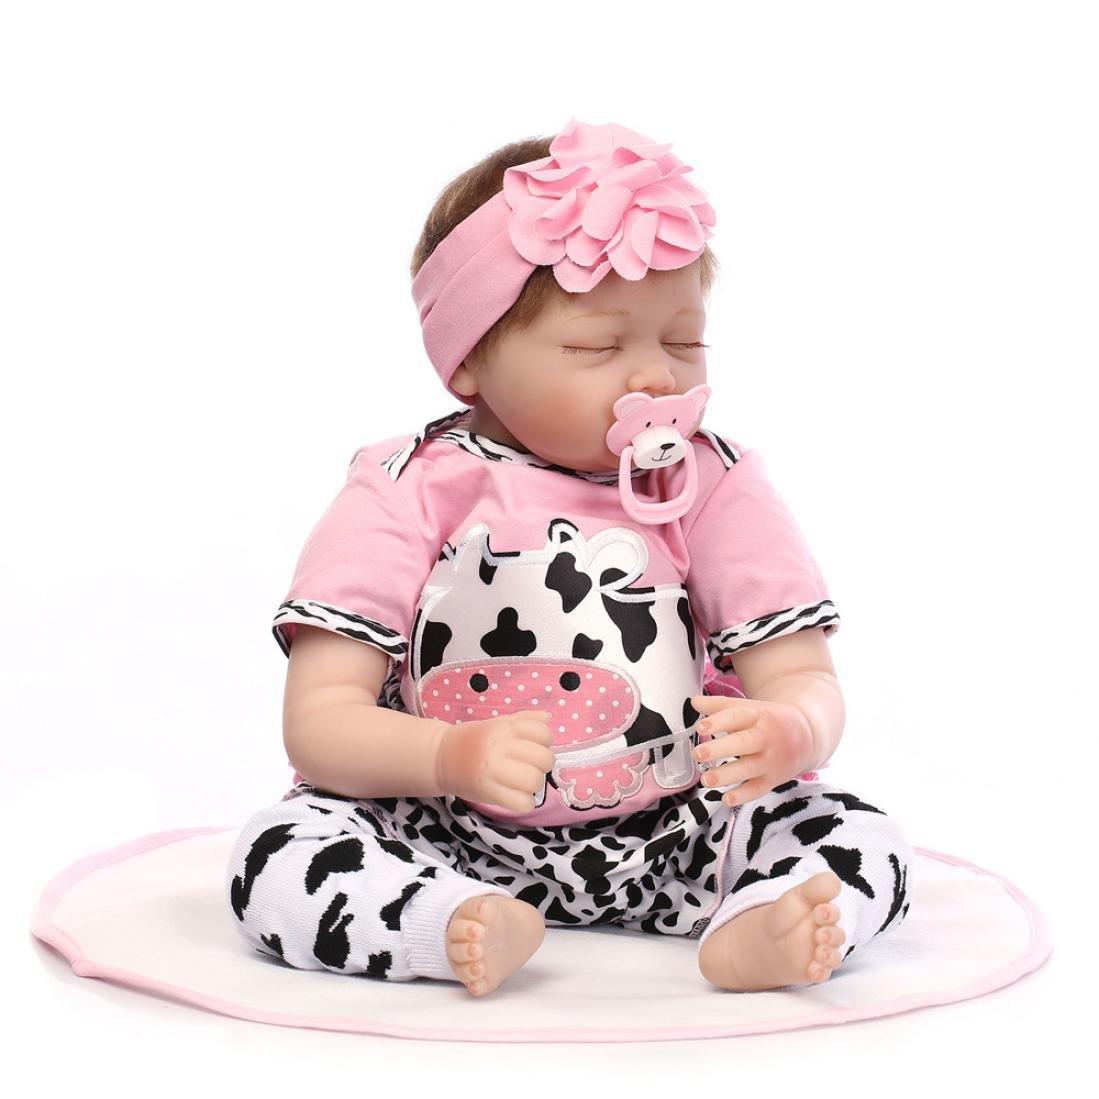 dirance Lifelike Reborn人形Sleepingソフトシリコンフルボディリアルなピンクガールズ人形ビニールreallike新生児赤ちゃん人形with Clothes 55 cm、子供ギフトfor Ages 3 +、under 100ドル F DR  ピンク B07BVTNMSC